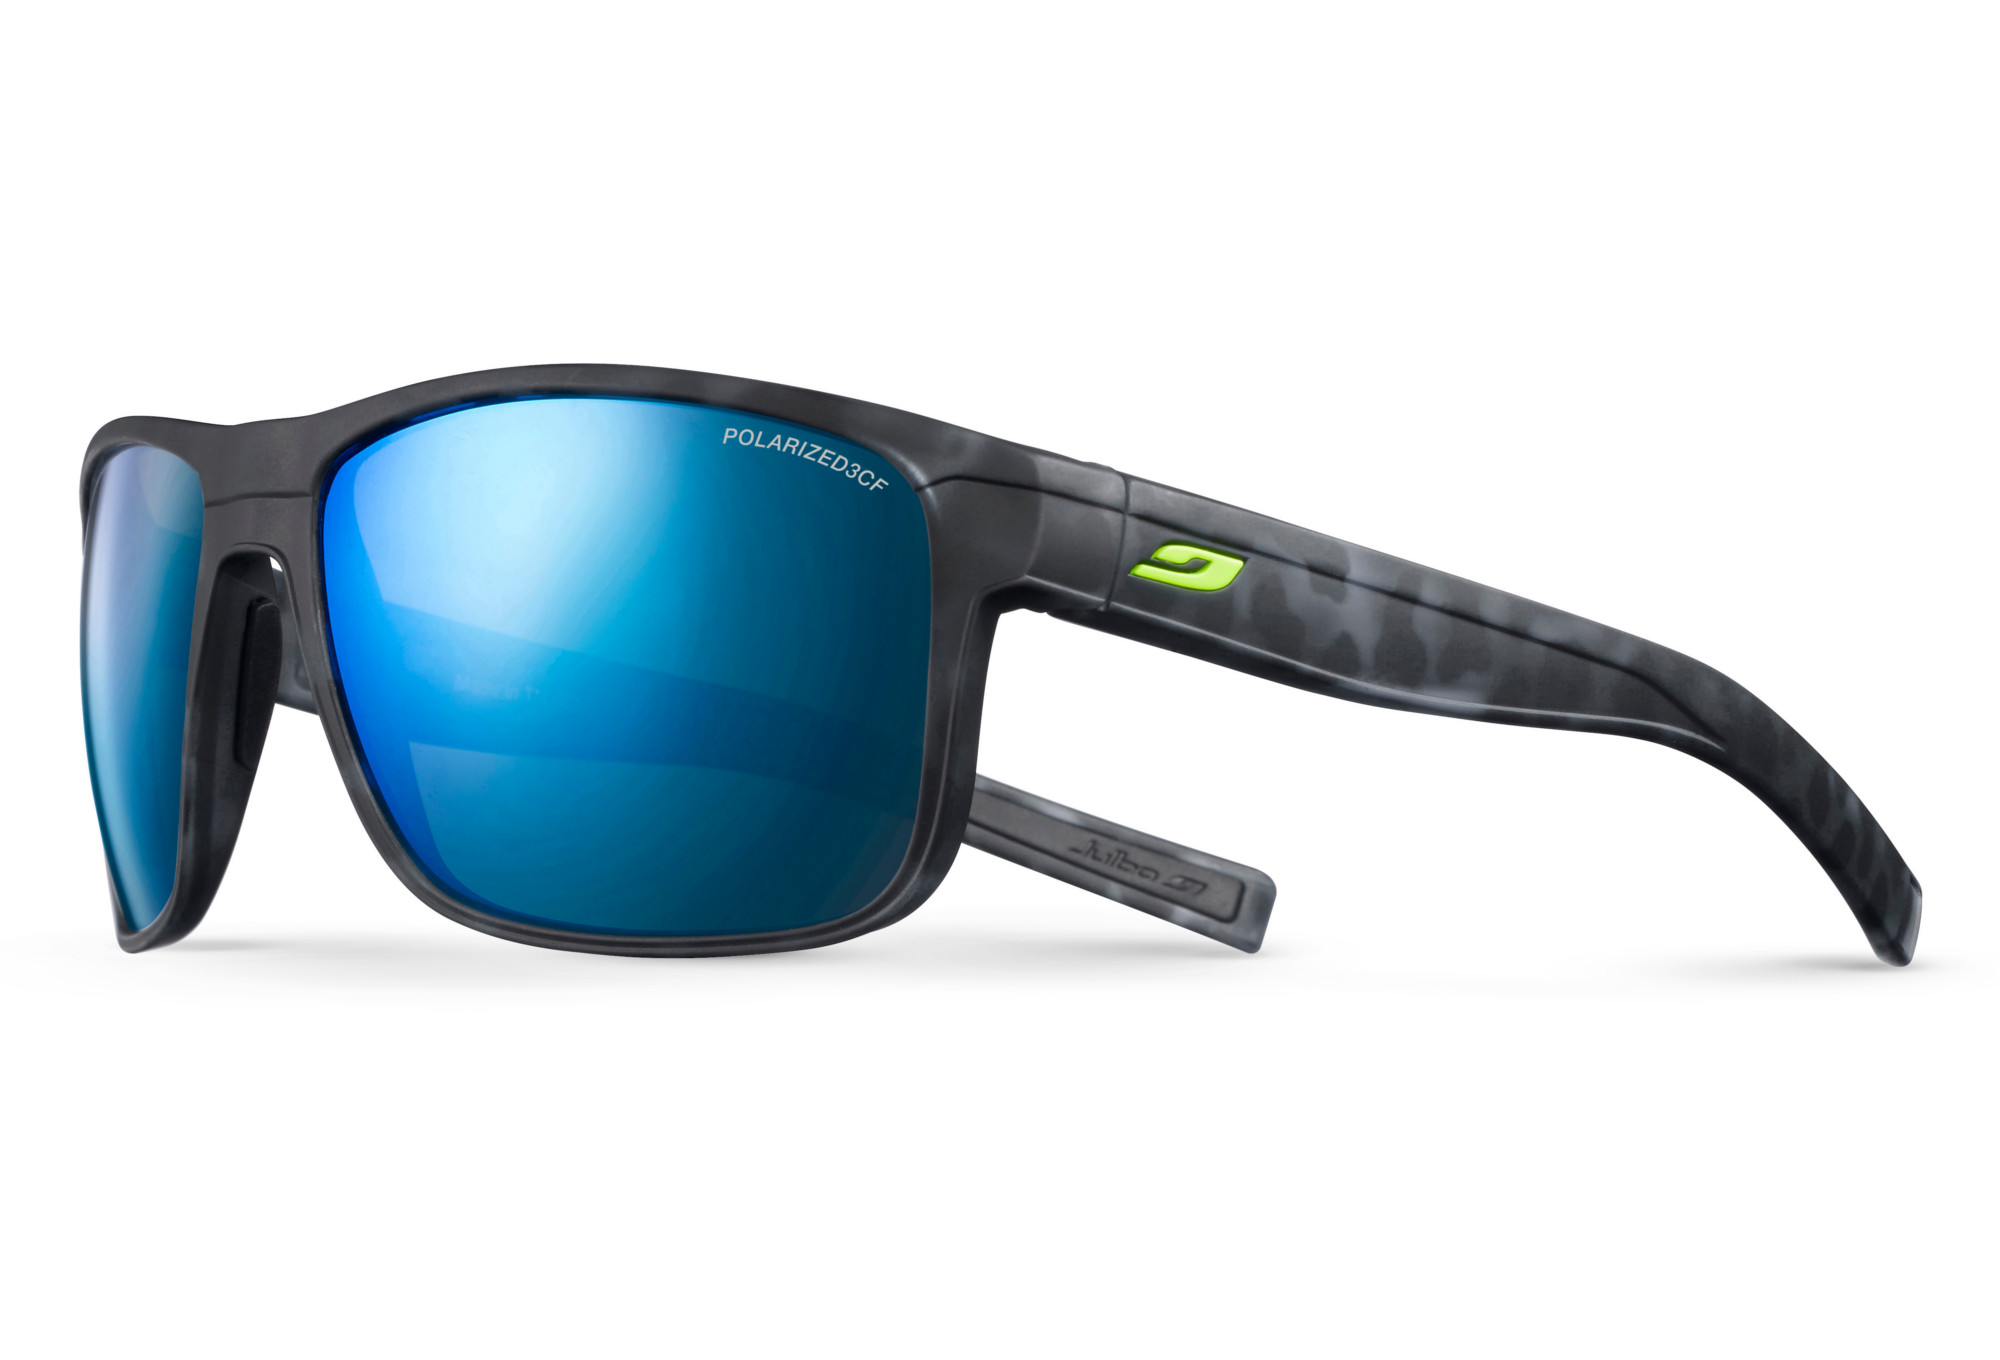 477e58429623 Julbo Renegade Sunglasses Polarized 3CF Black - Blue